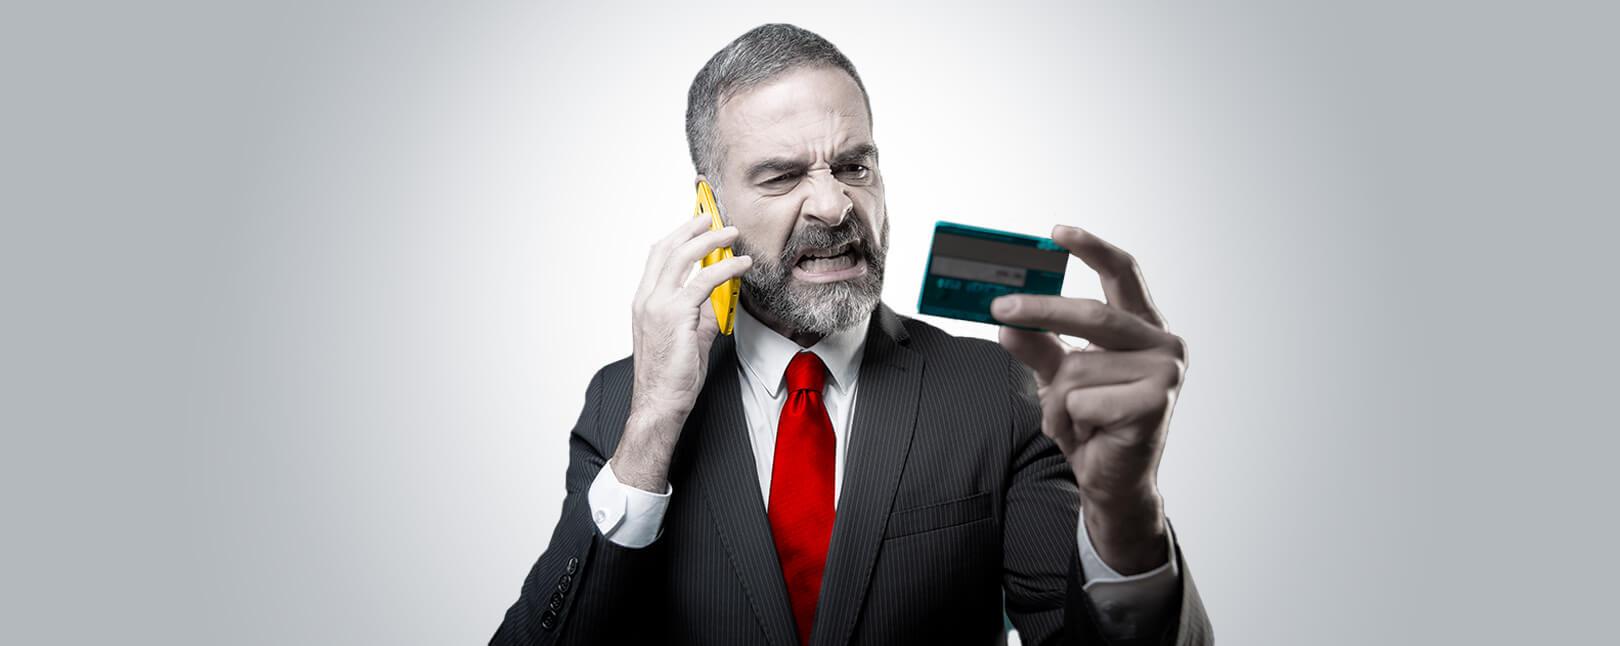 payment card dispute